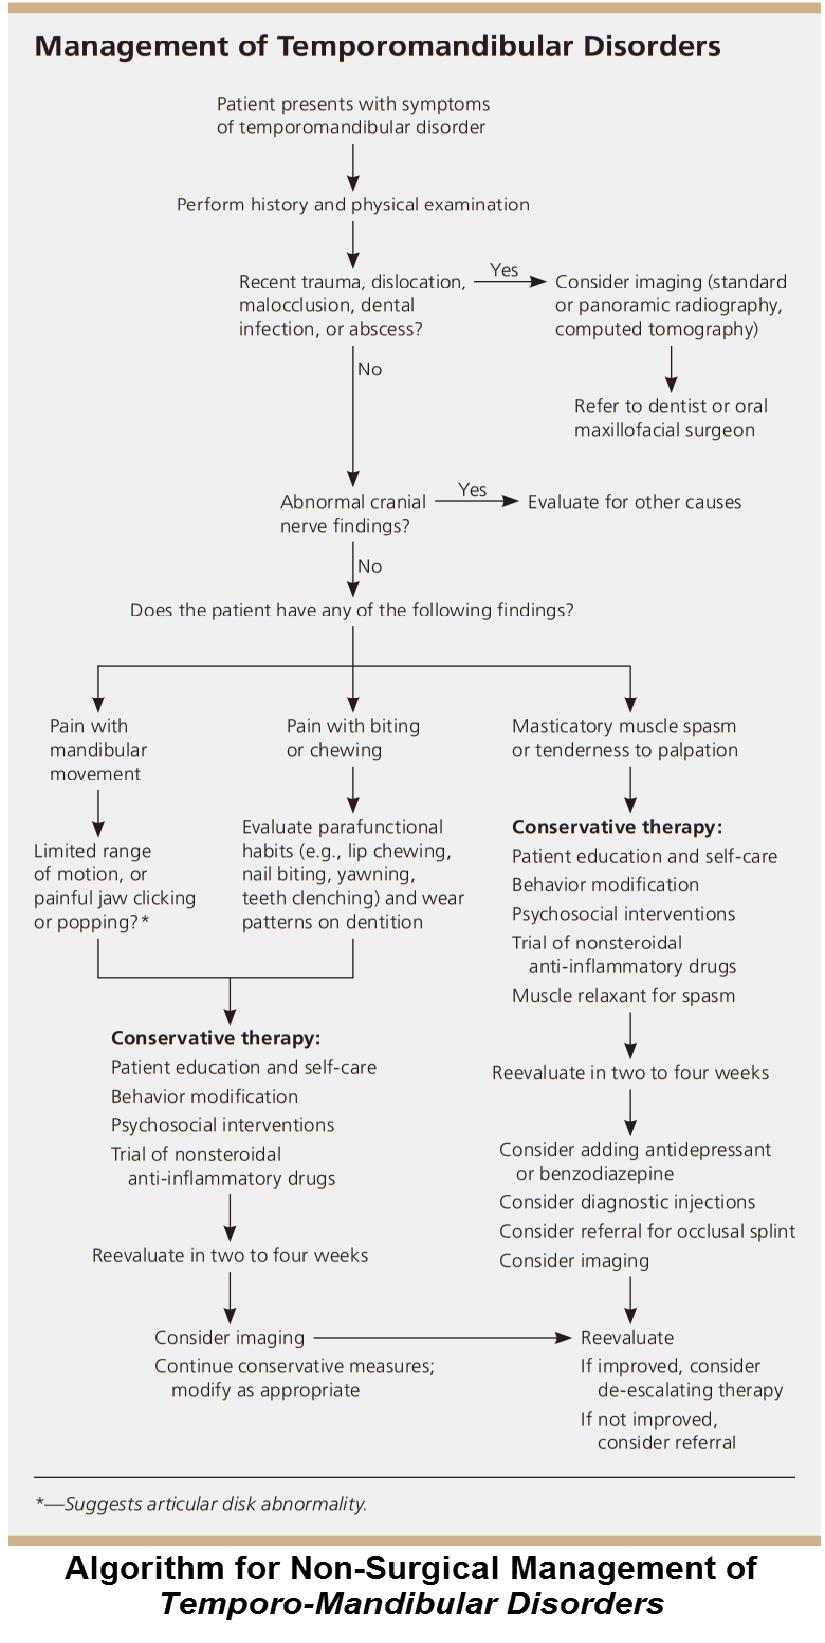 Algorithm_for_Non-Surgical_Management_of_Temporo-Mandibular_Disorders-825x1643